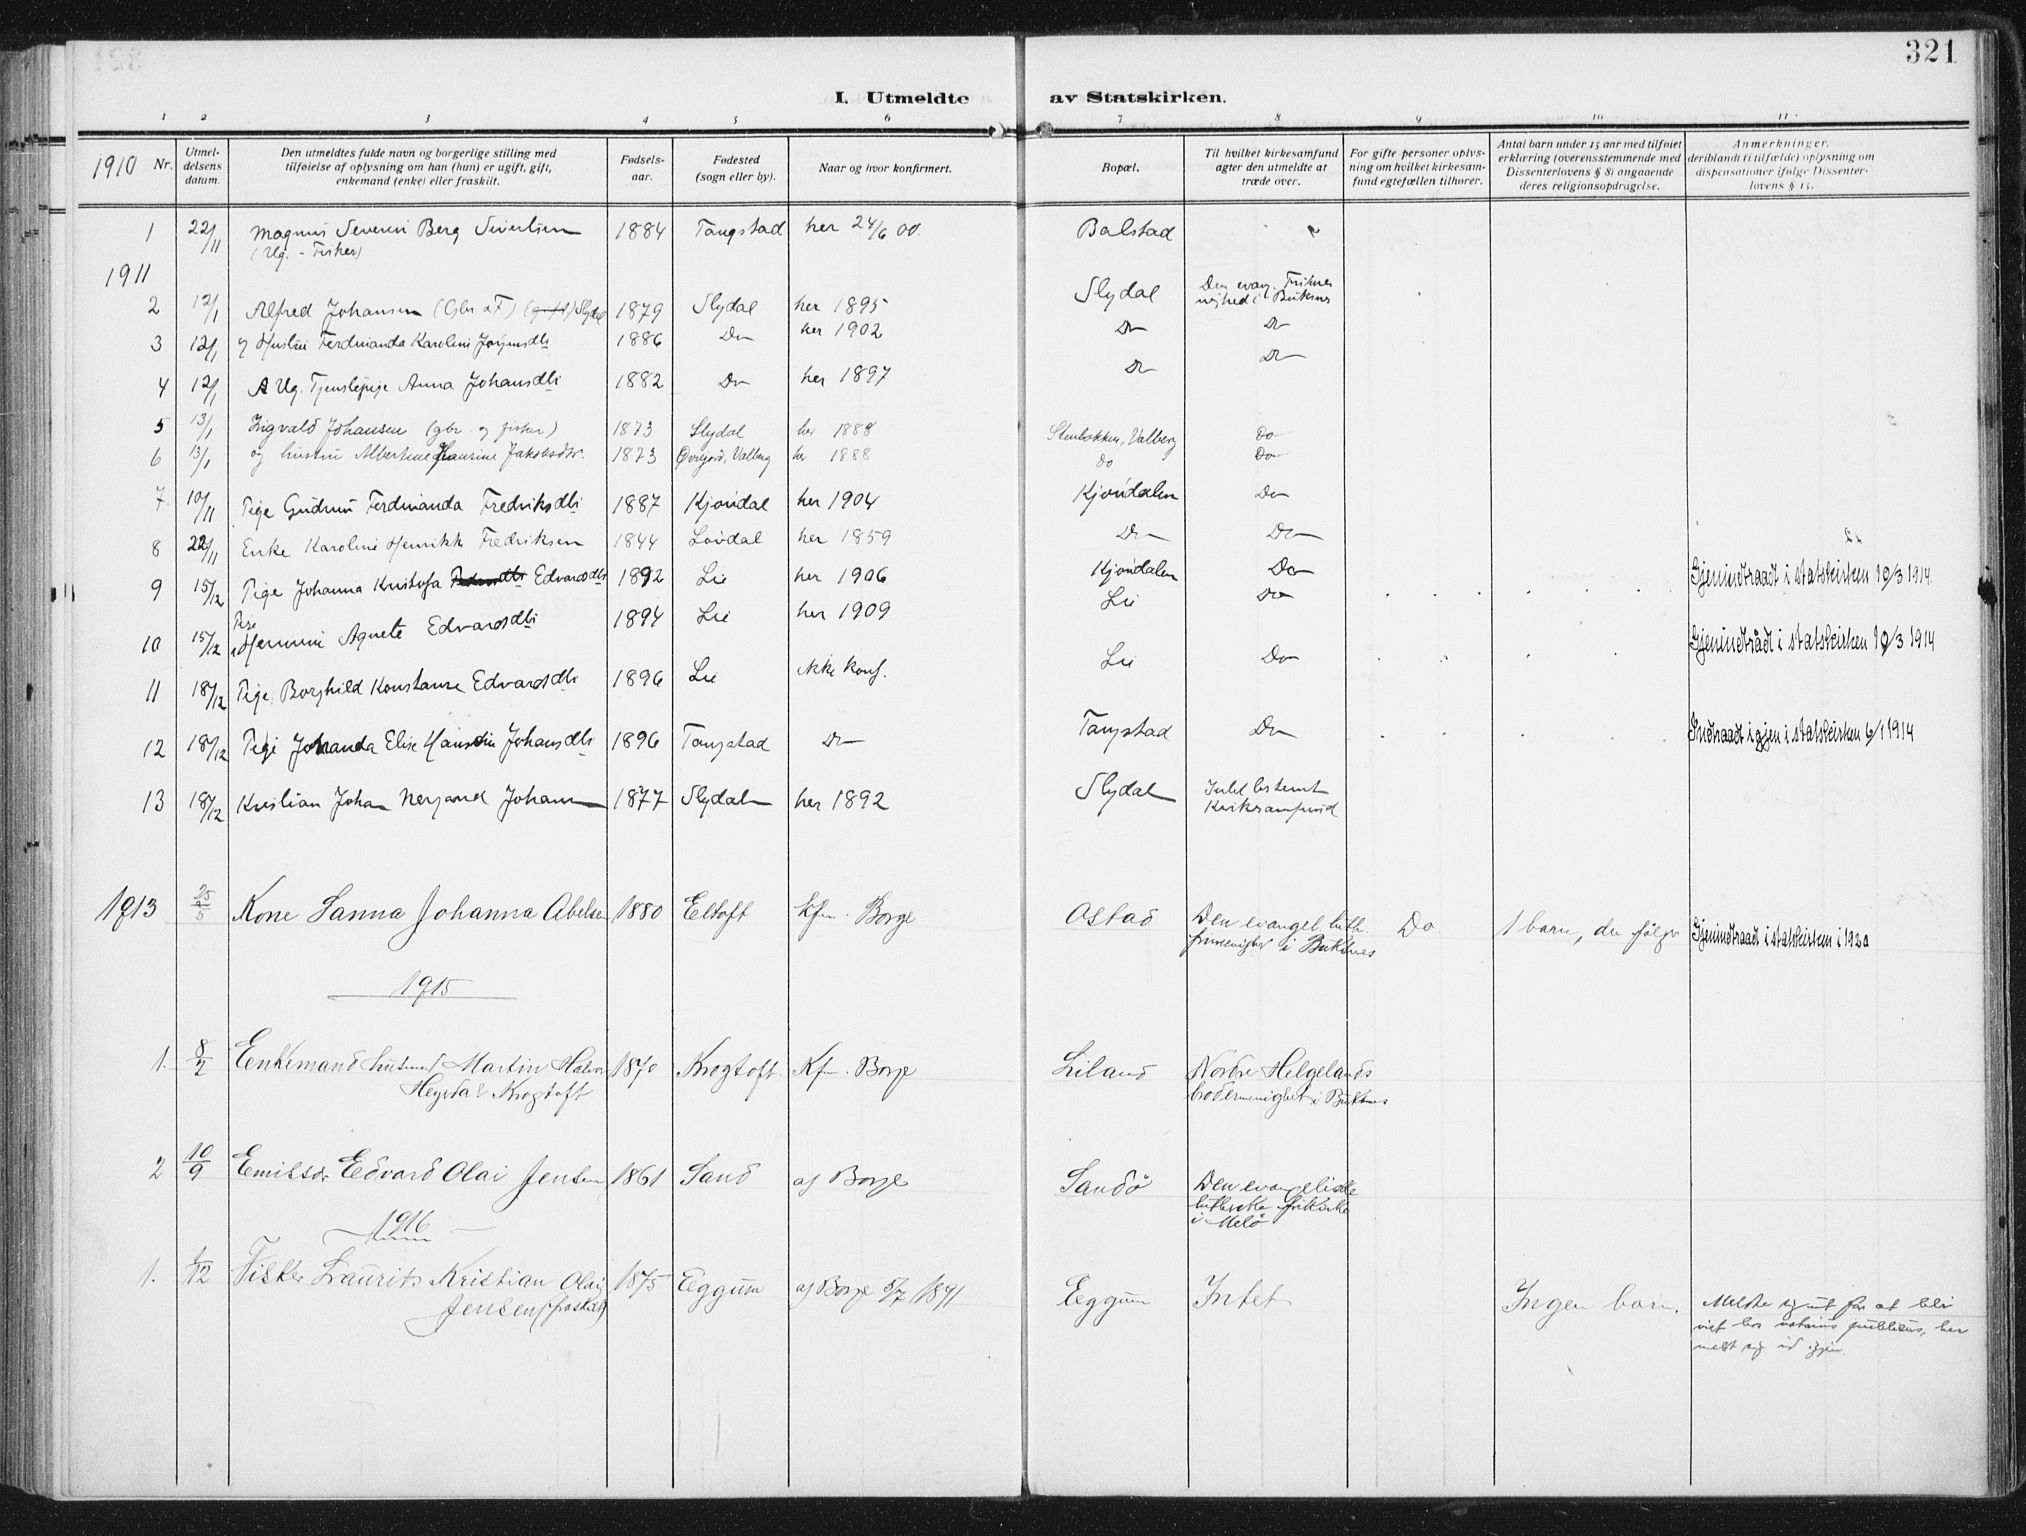 SAT, Ministerialprotokoller, klokkerbøker og fødselsregistre - Nordland, 880/L1135: Ministerialbok nr. 880A09, 1908-1919, s. 321